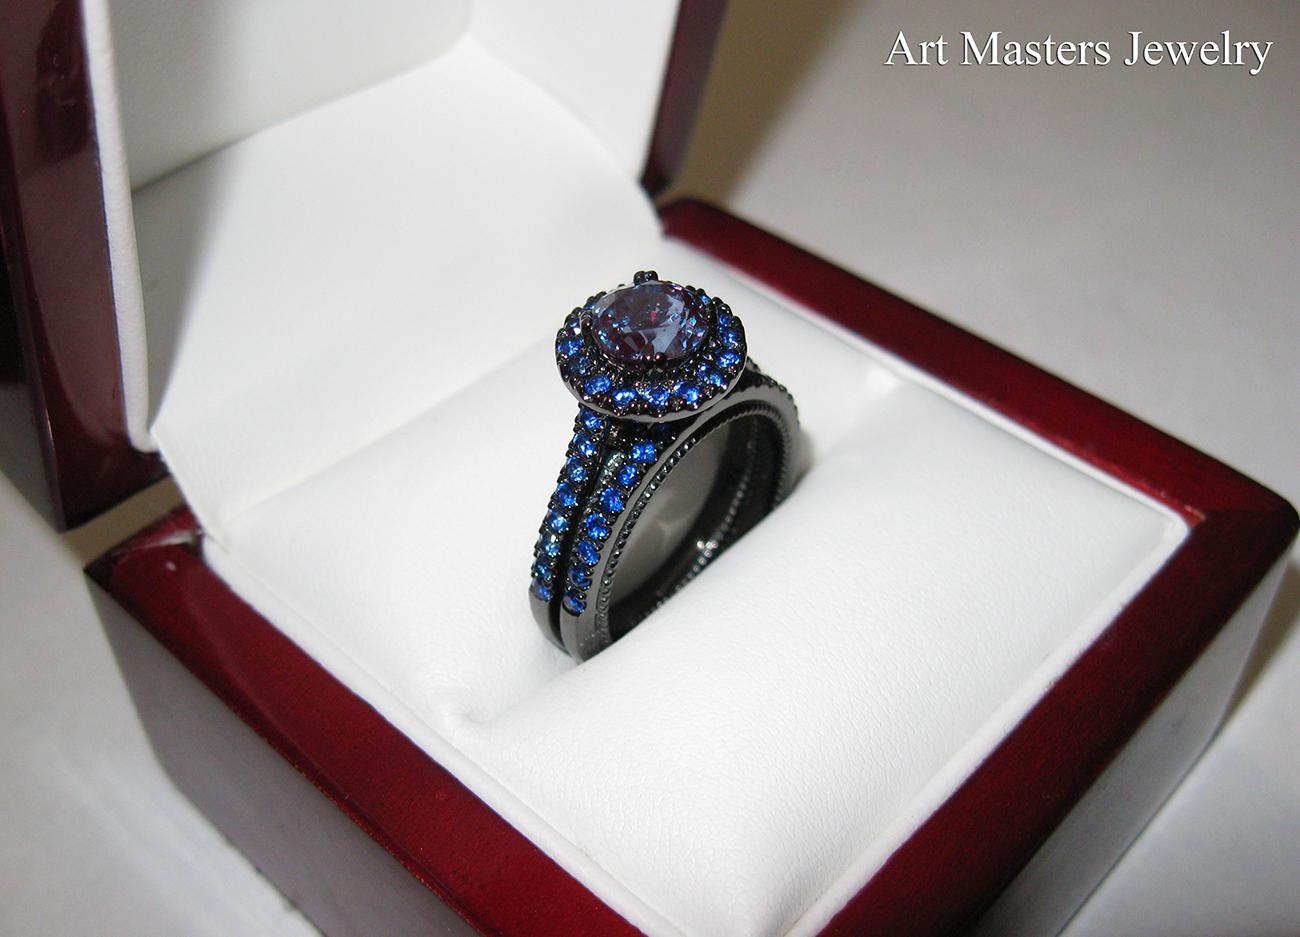 caravaggio ring black gold wedding band Caravaggio 14K Black Gold 1 0 Ct Russian Alexandrite Tanzanite Engagement Ring Wedding Band Set RS